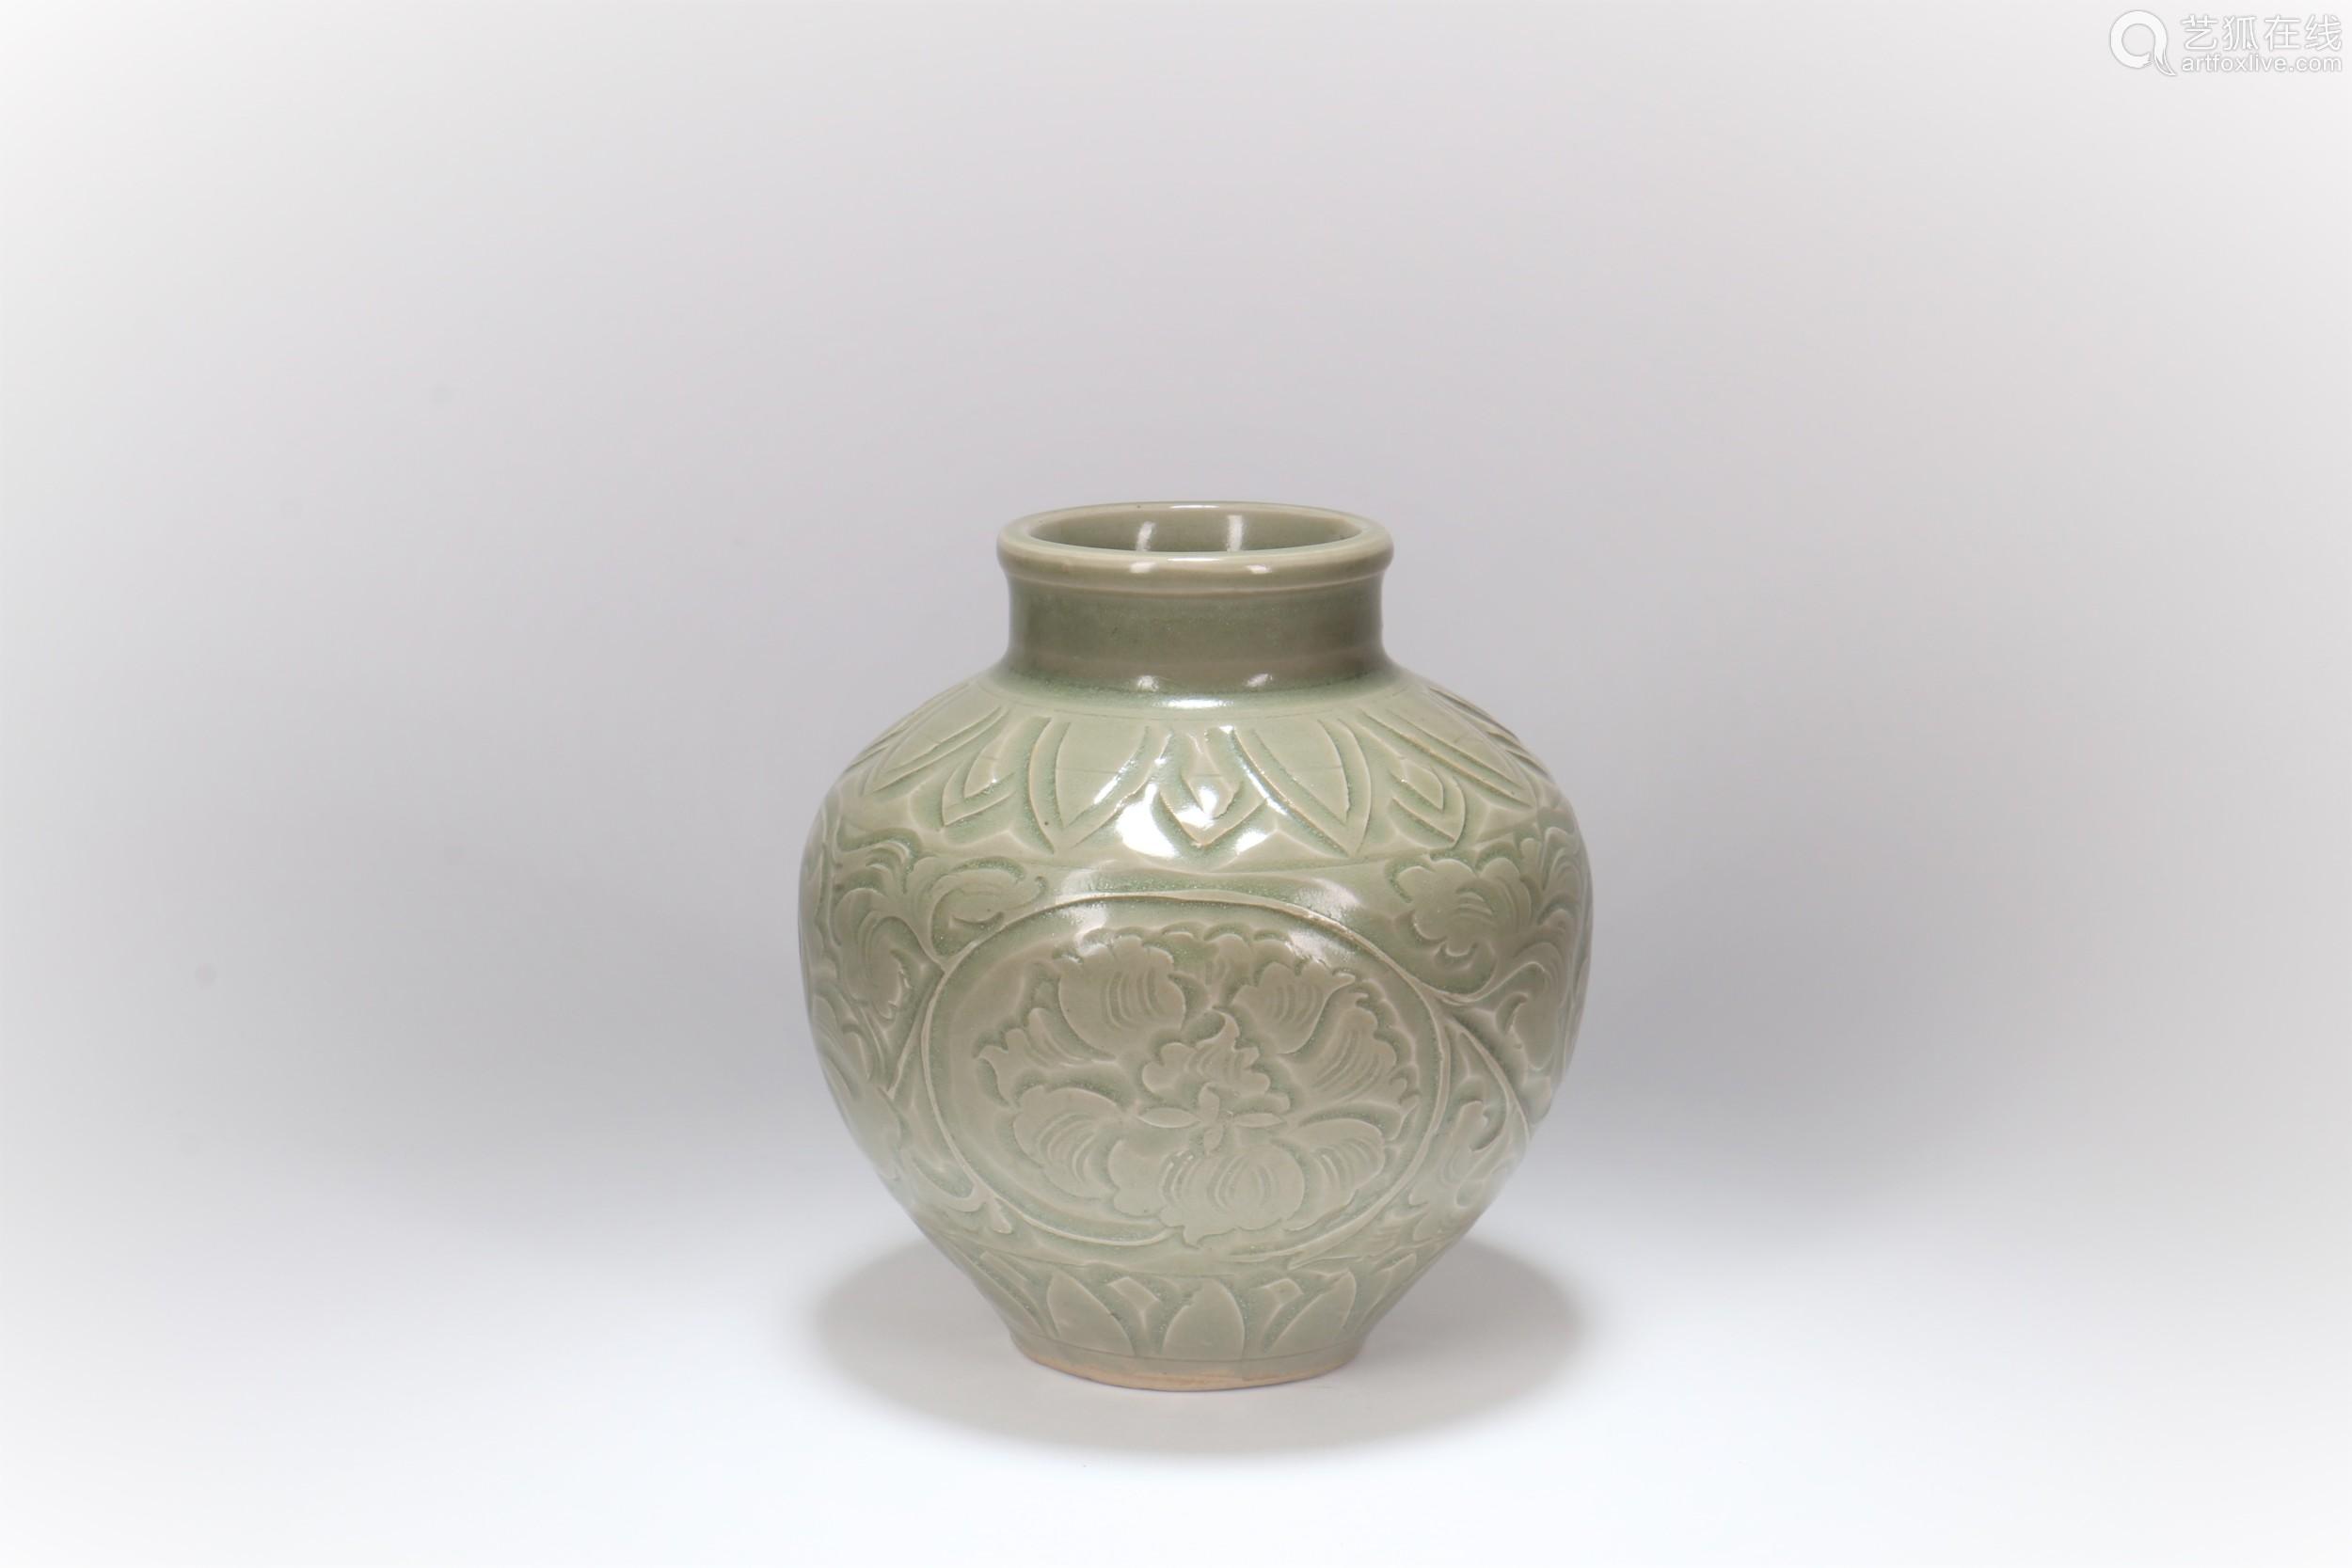 A Chinese Celadon Porcelain Jar